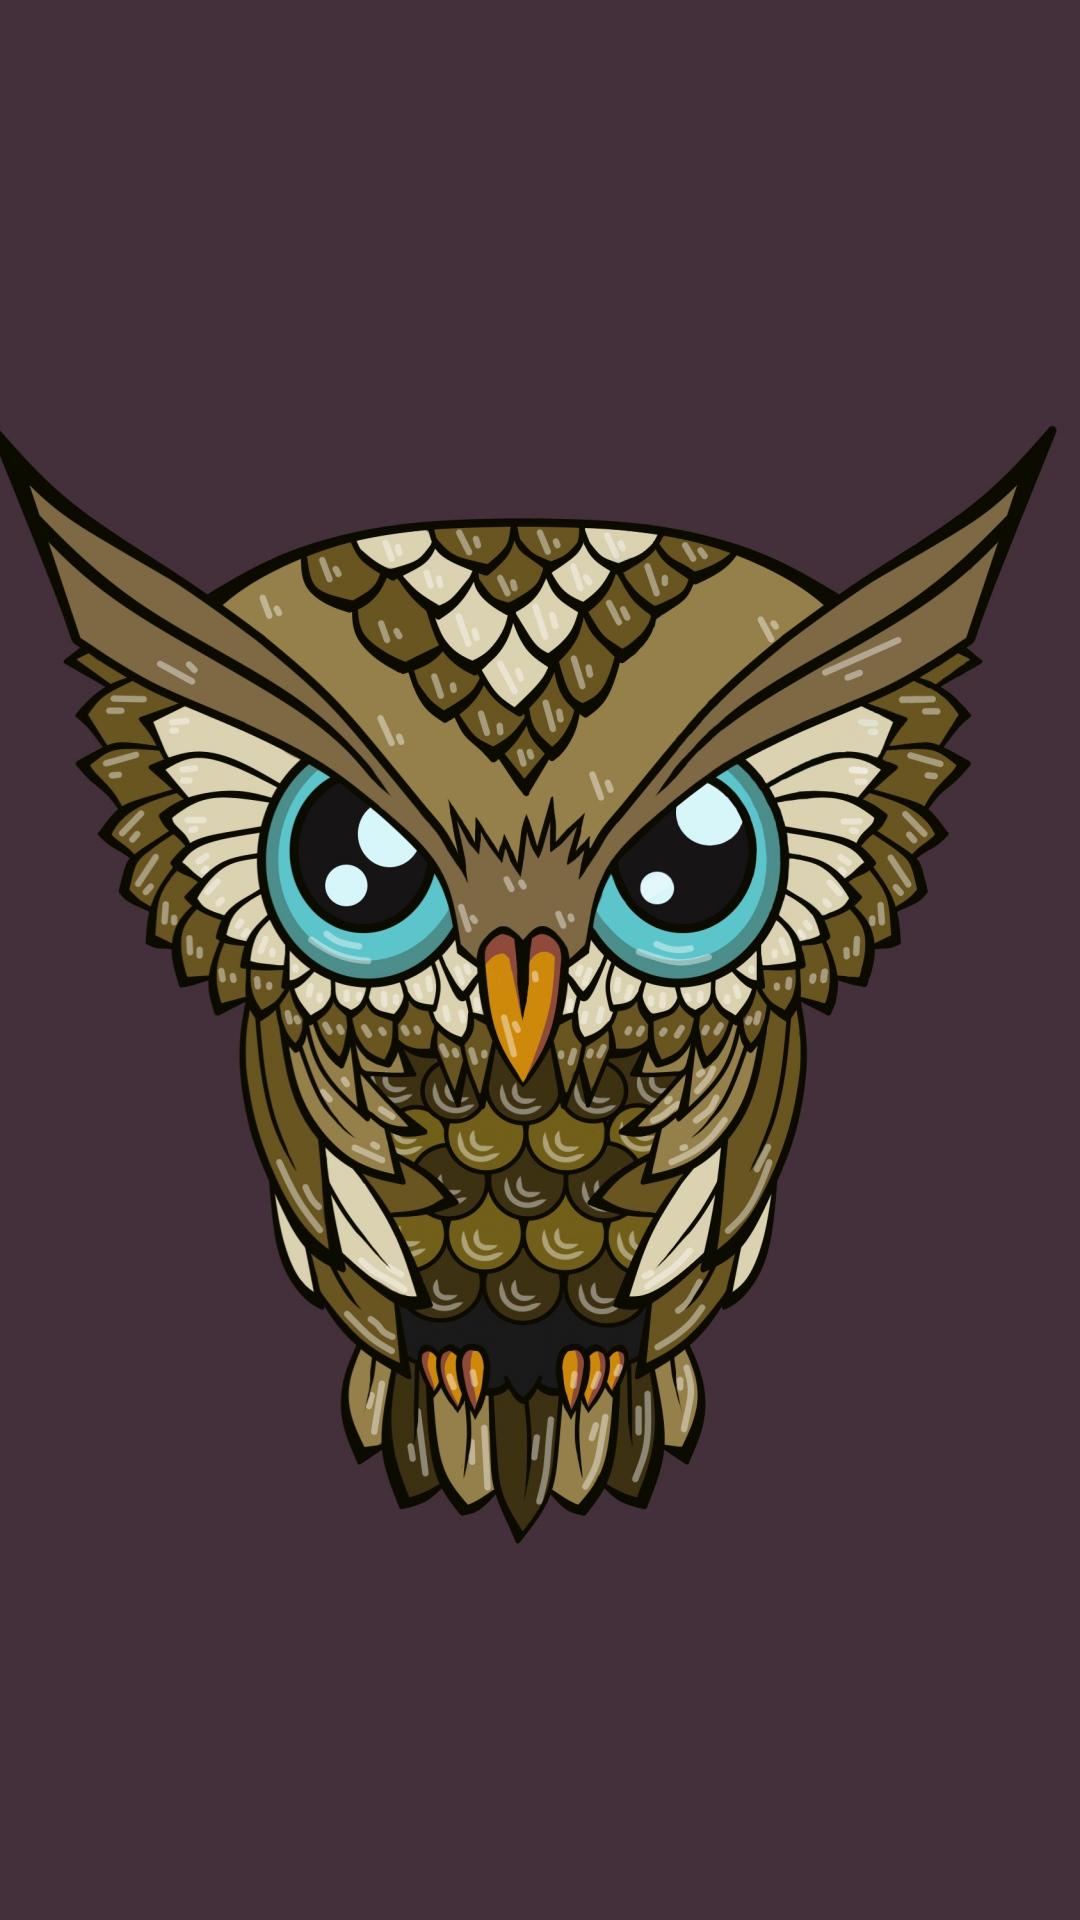 Free Cute Owl Wallpapers Hd Cute Owl Wallpaper For Android Pixelstalk Net